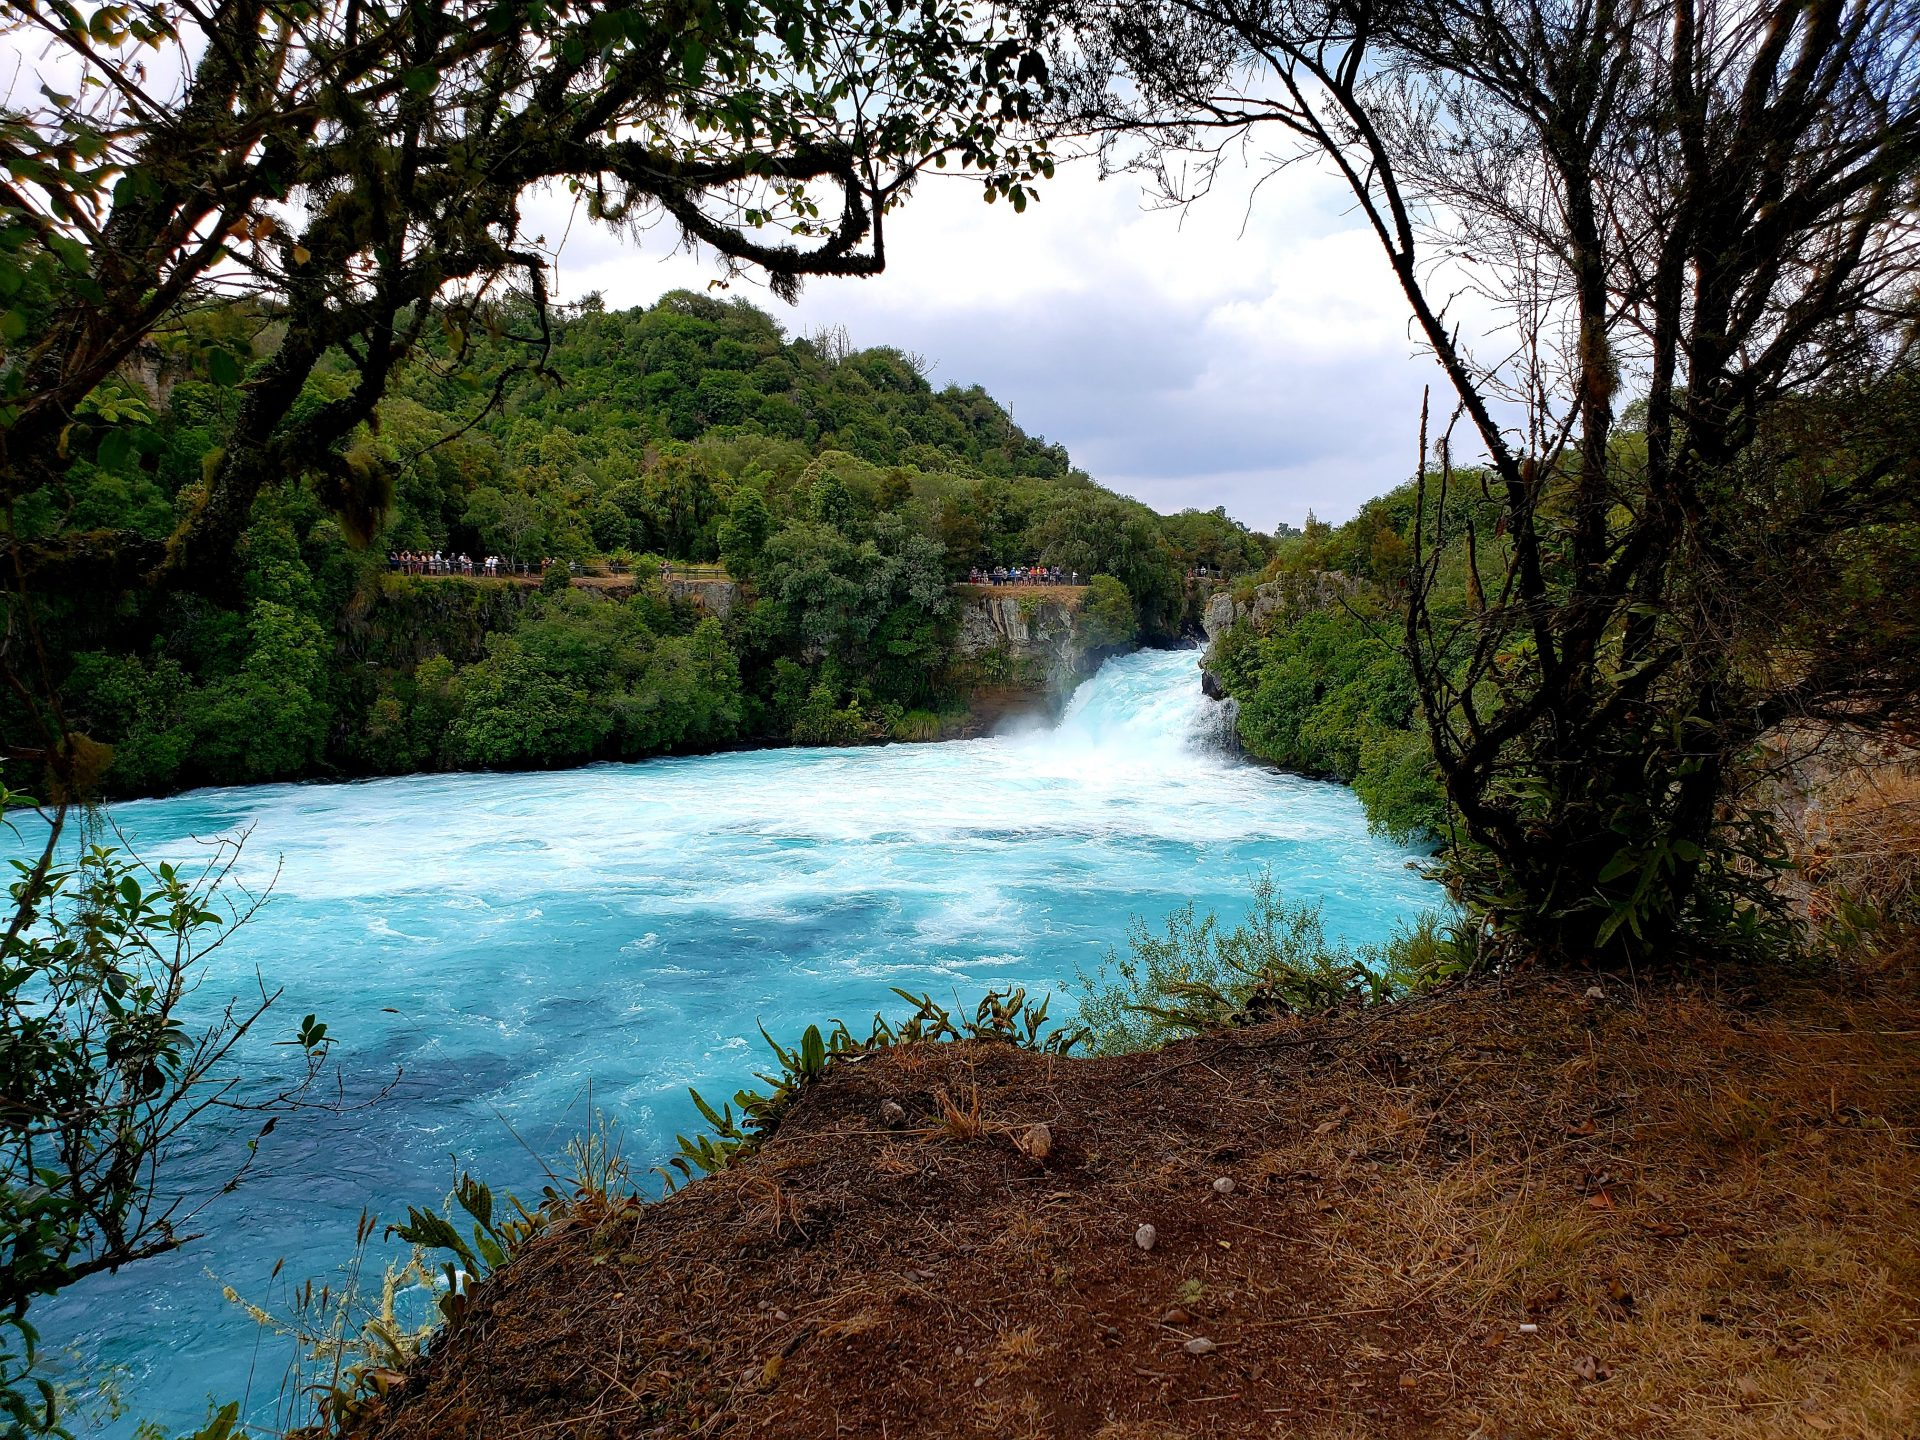 Taupo, Waikato, New Zealand – 2 Day Trip